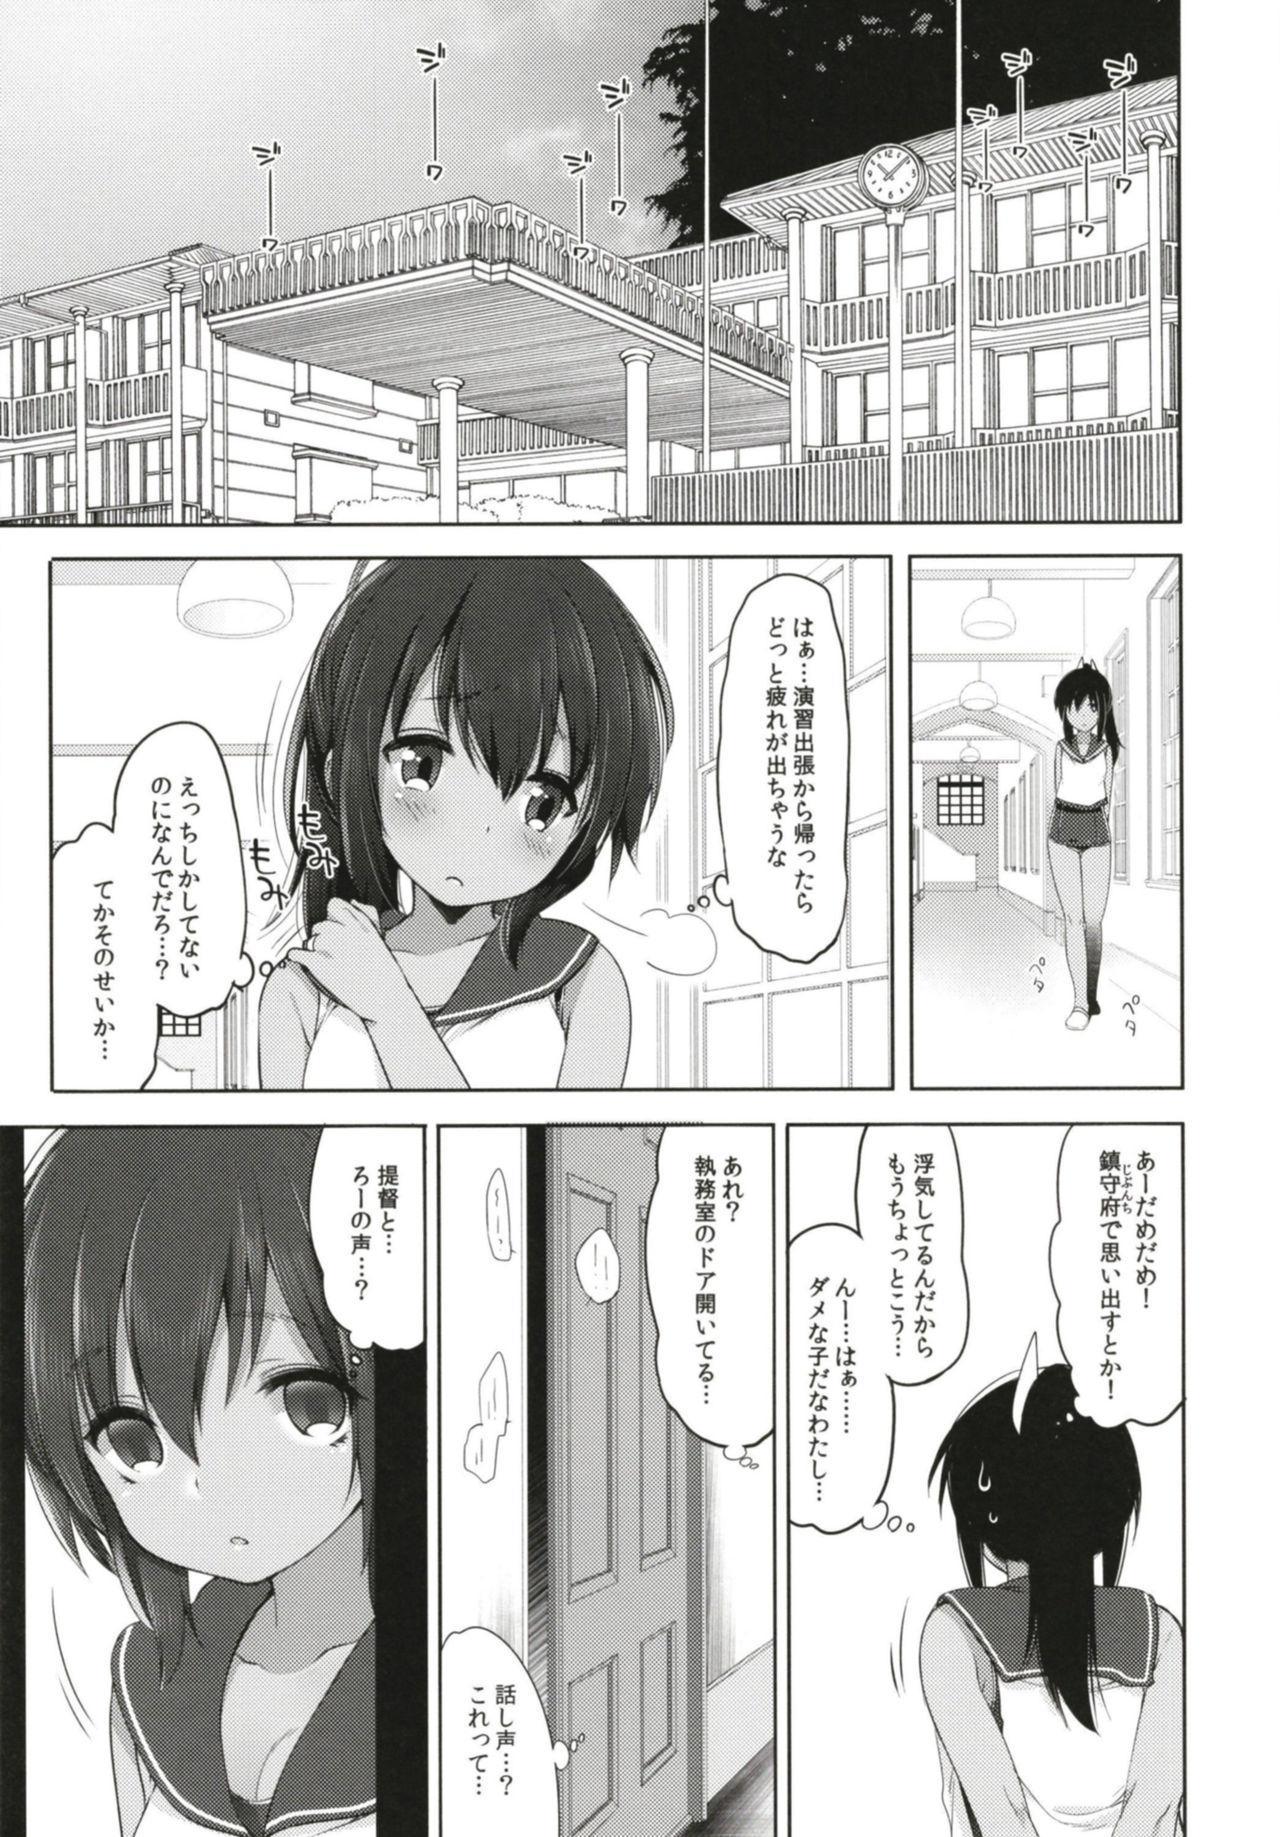 [French letter (Fujisaki Hikari)] Hitonatsu no Ayamachi -I-401 Soushuuhen- (Kantai Collection -KanColle-) [Digital] 60